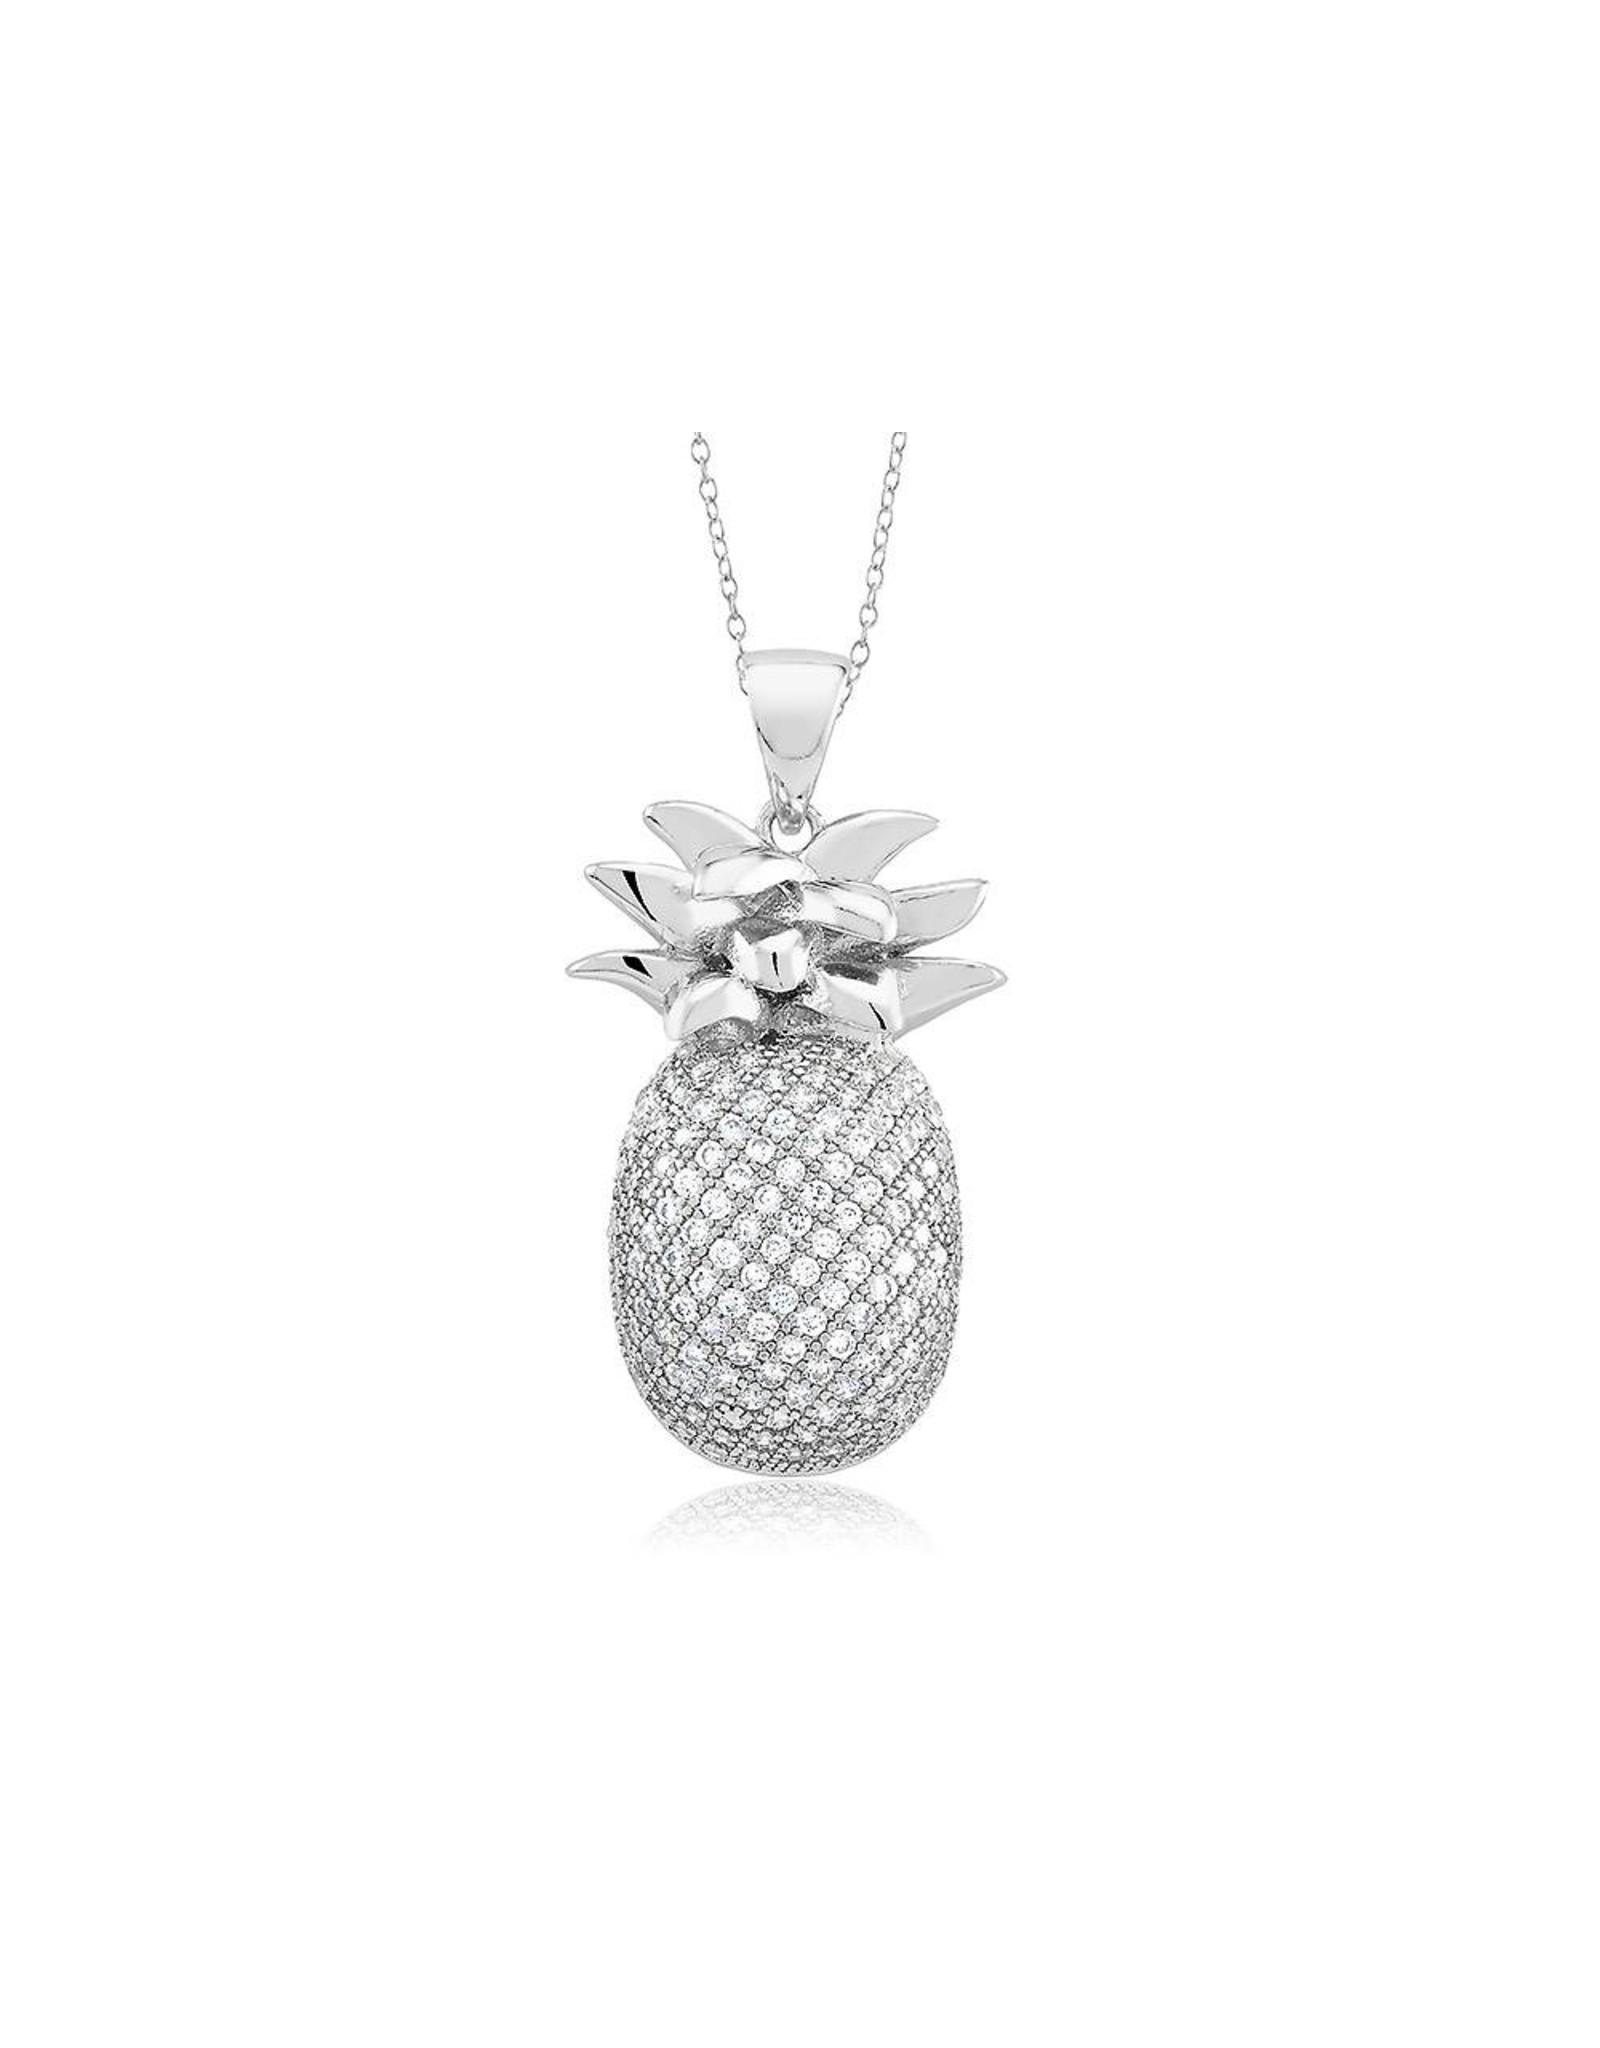 Pineapple - CZ Silver